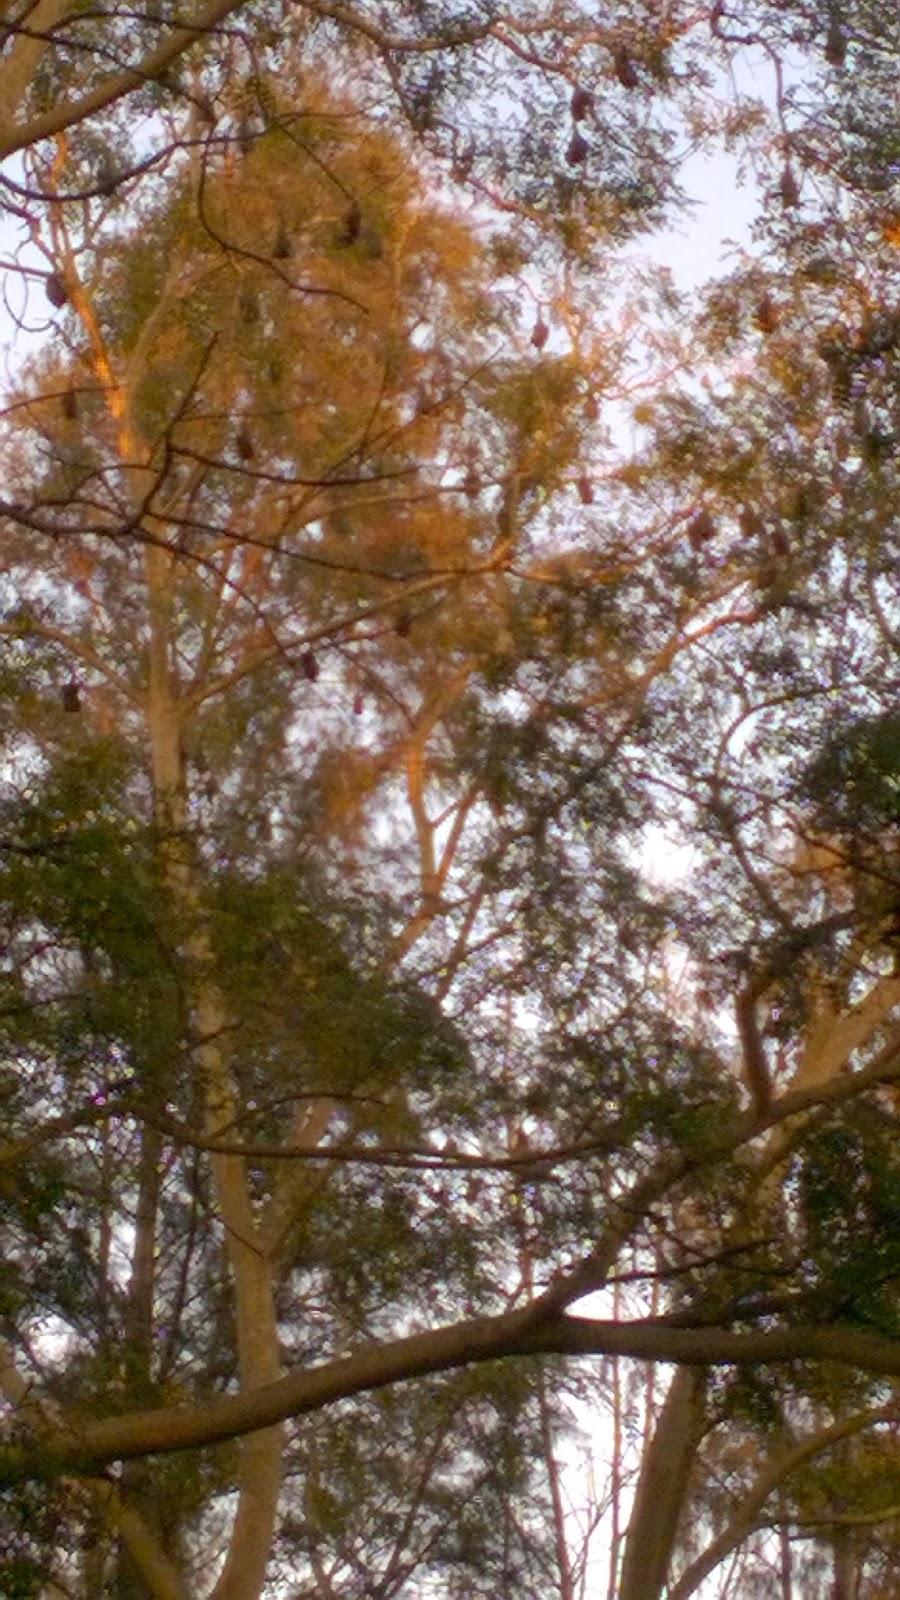 Trees, bat, bats, vampire